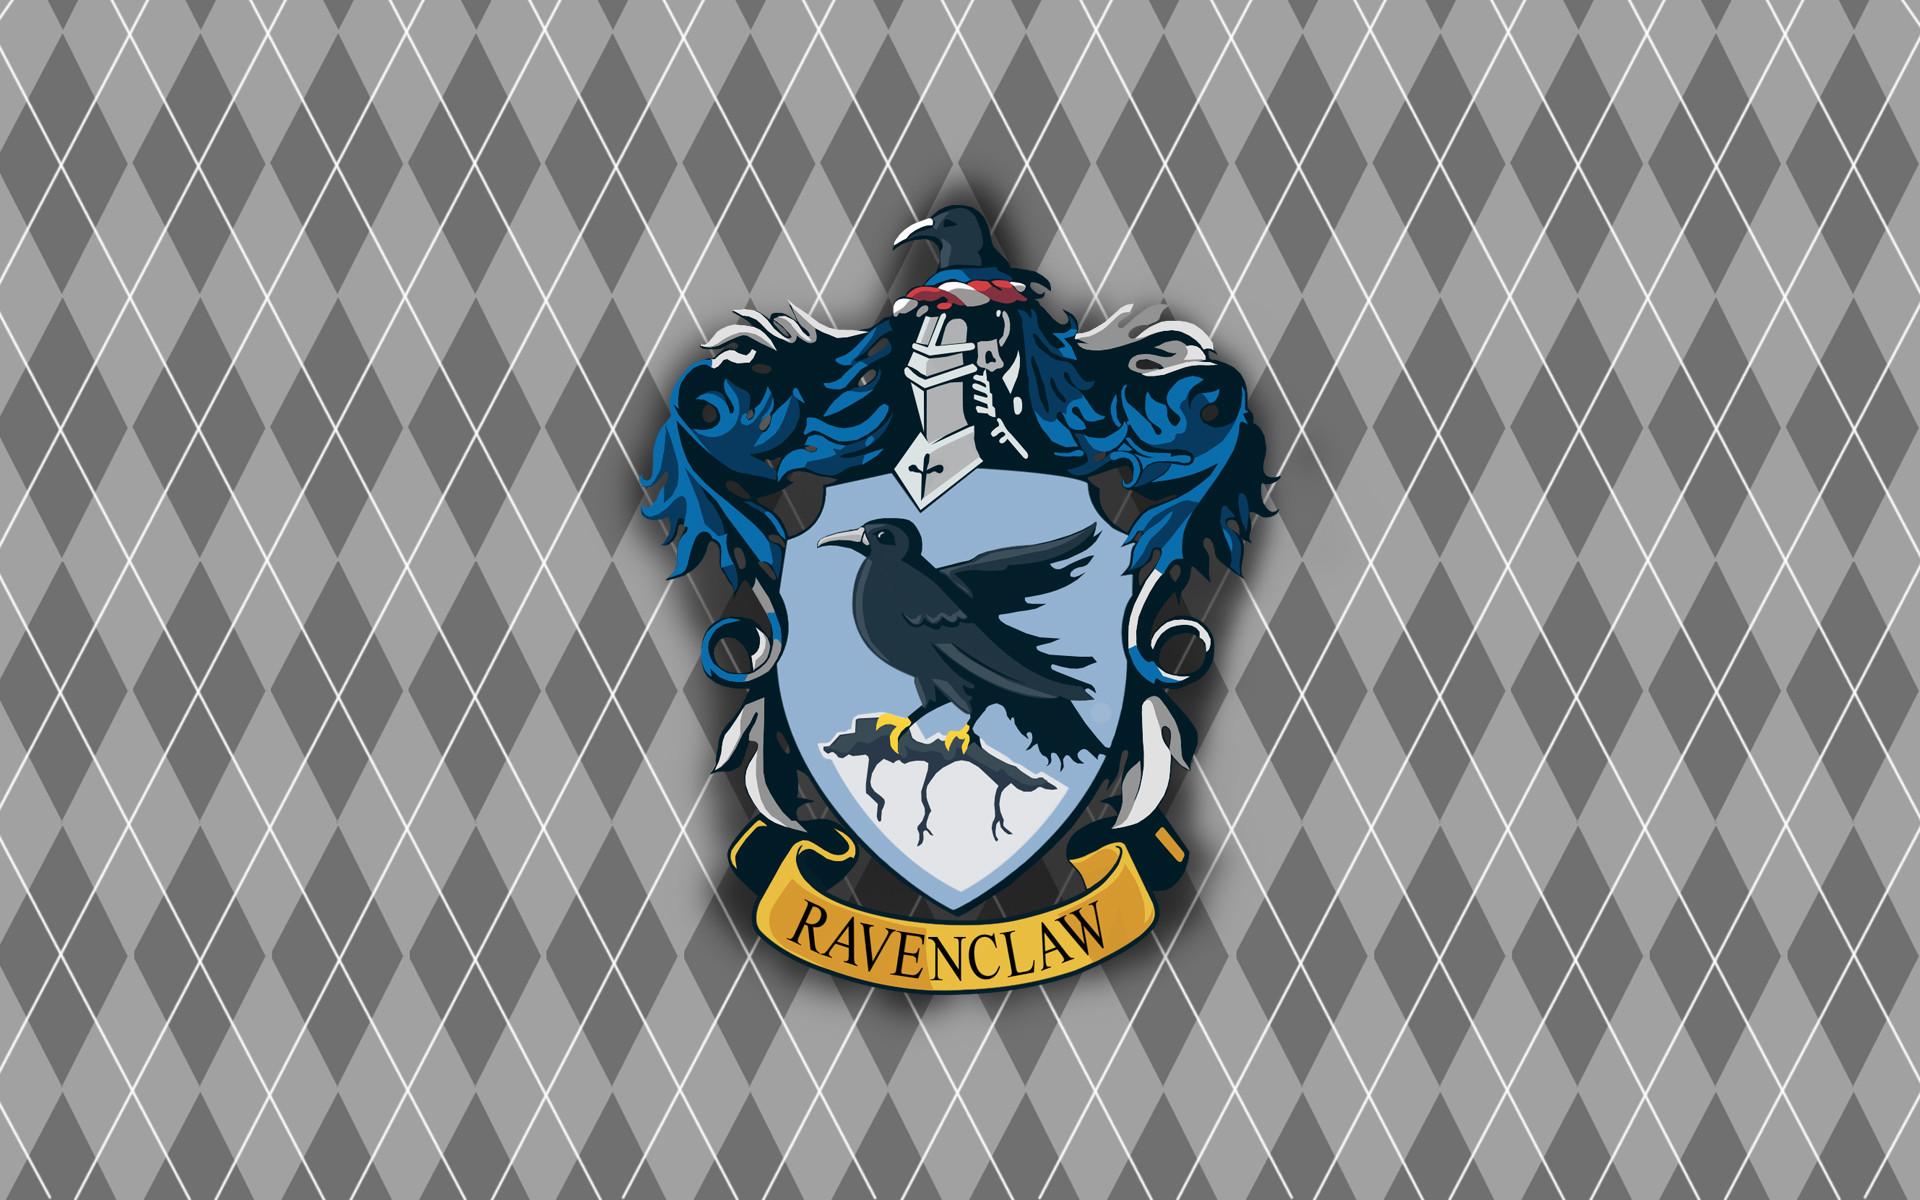 Ravenclaw Wallpaper by dragonlover28 on DeviantArt